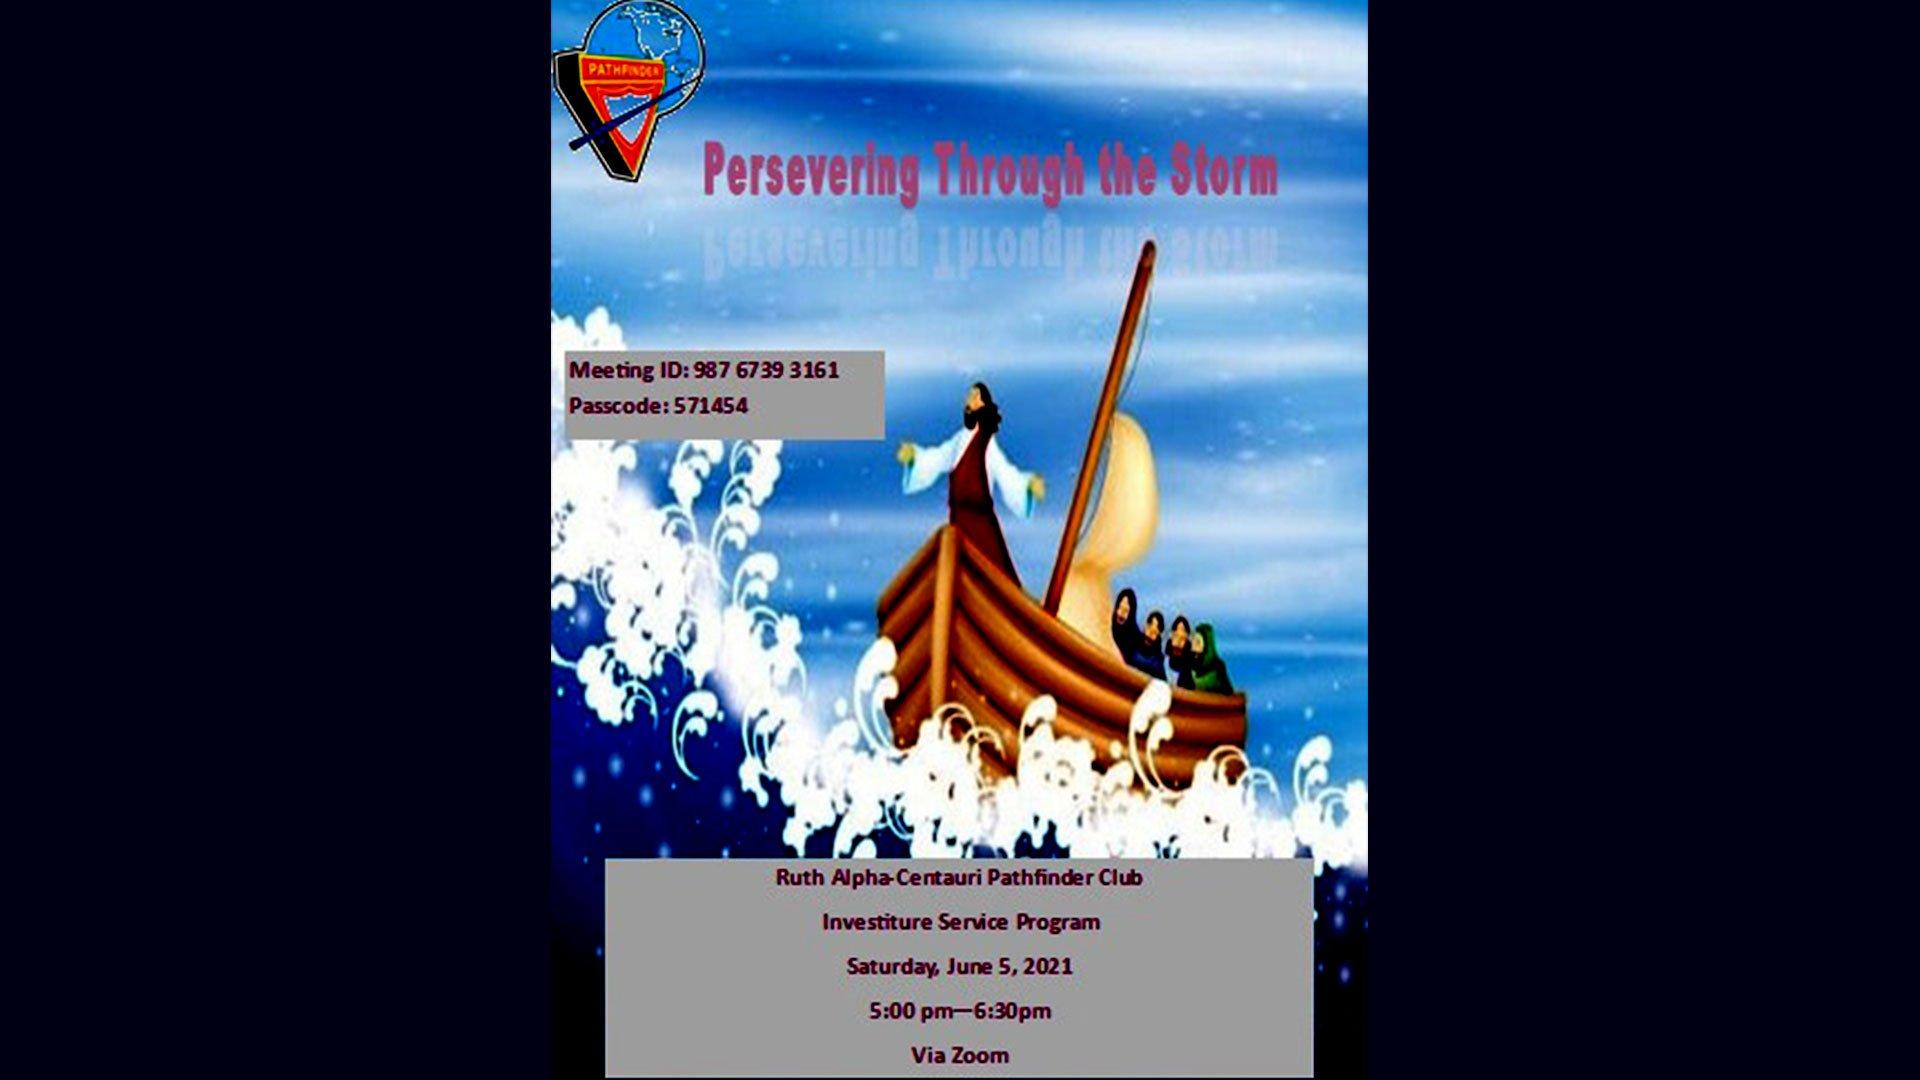 Pathfinders-Investiture-June-5 flyer